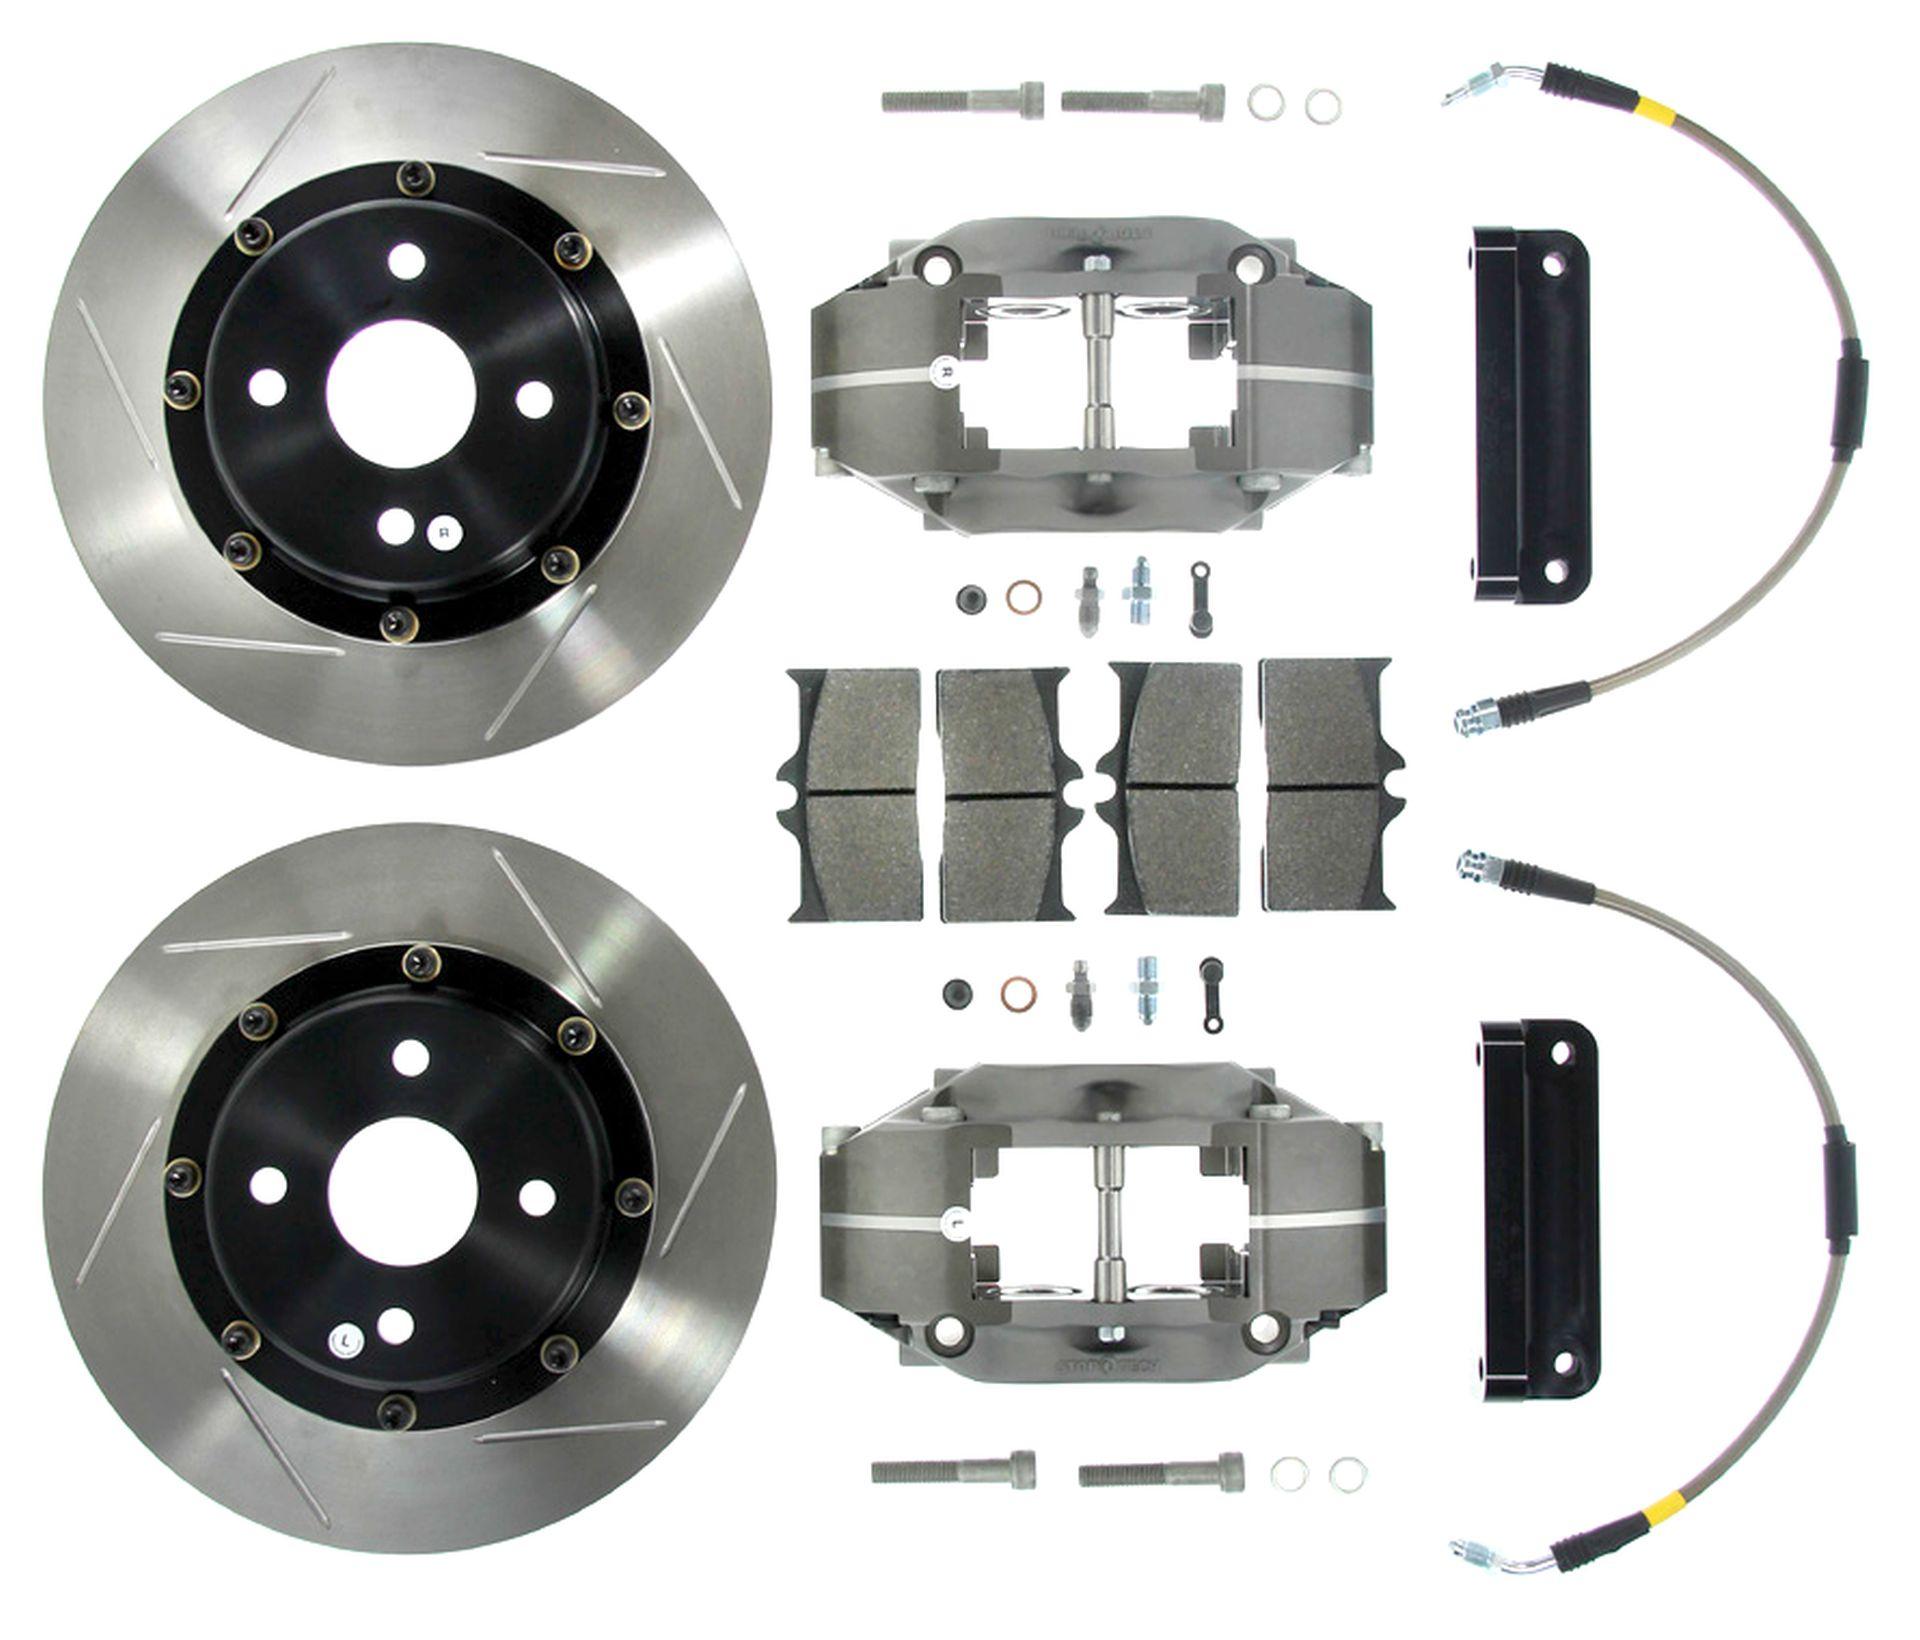 Centric Parts Has New StopTech Brake Kits for Mazda Miatas